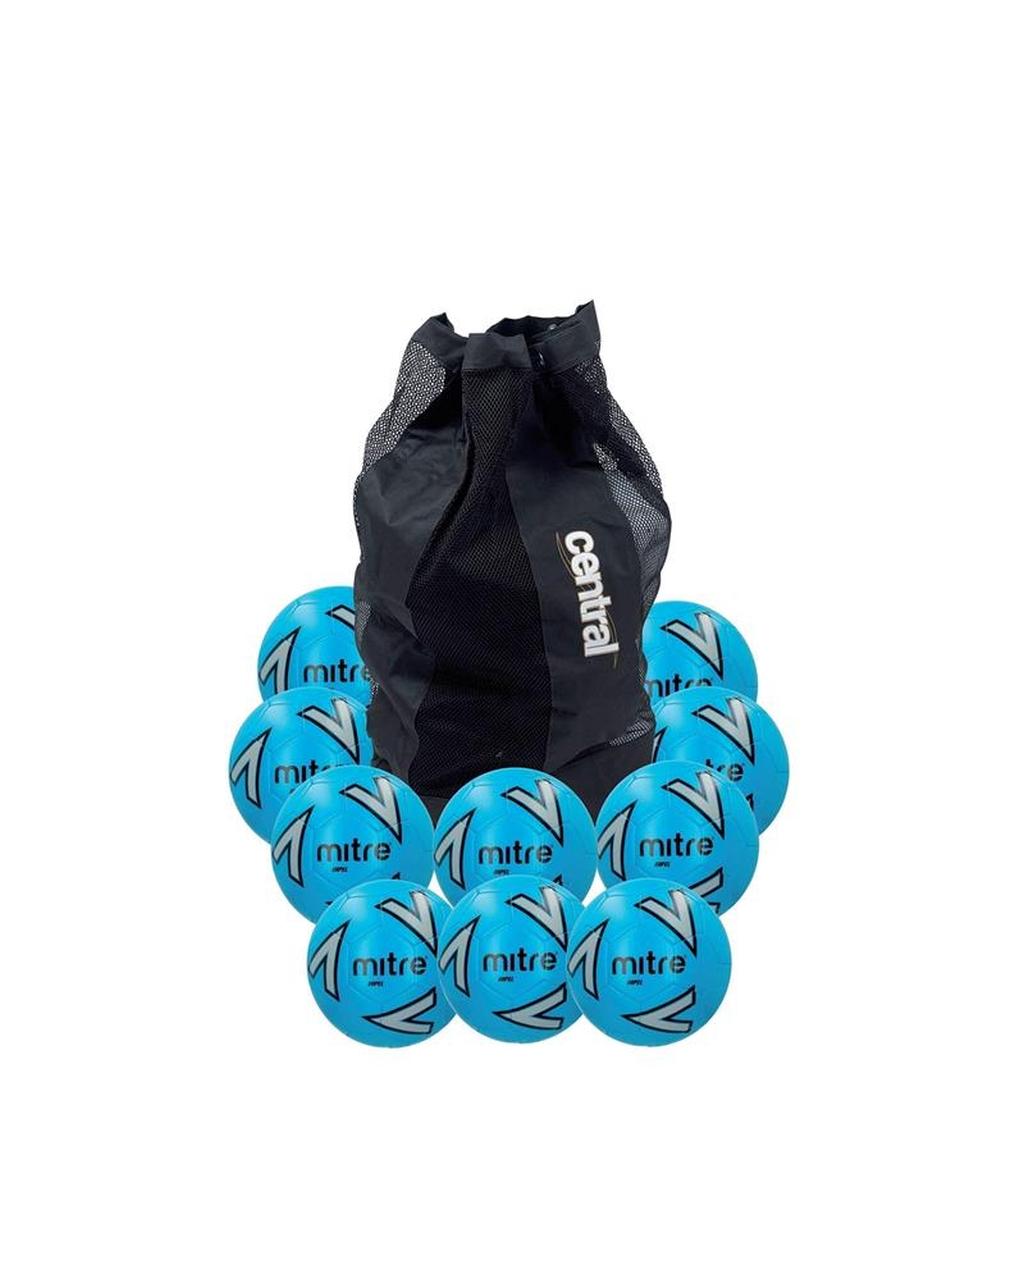 Impel training size 5 pk 10 Blue